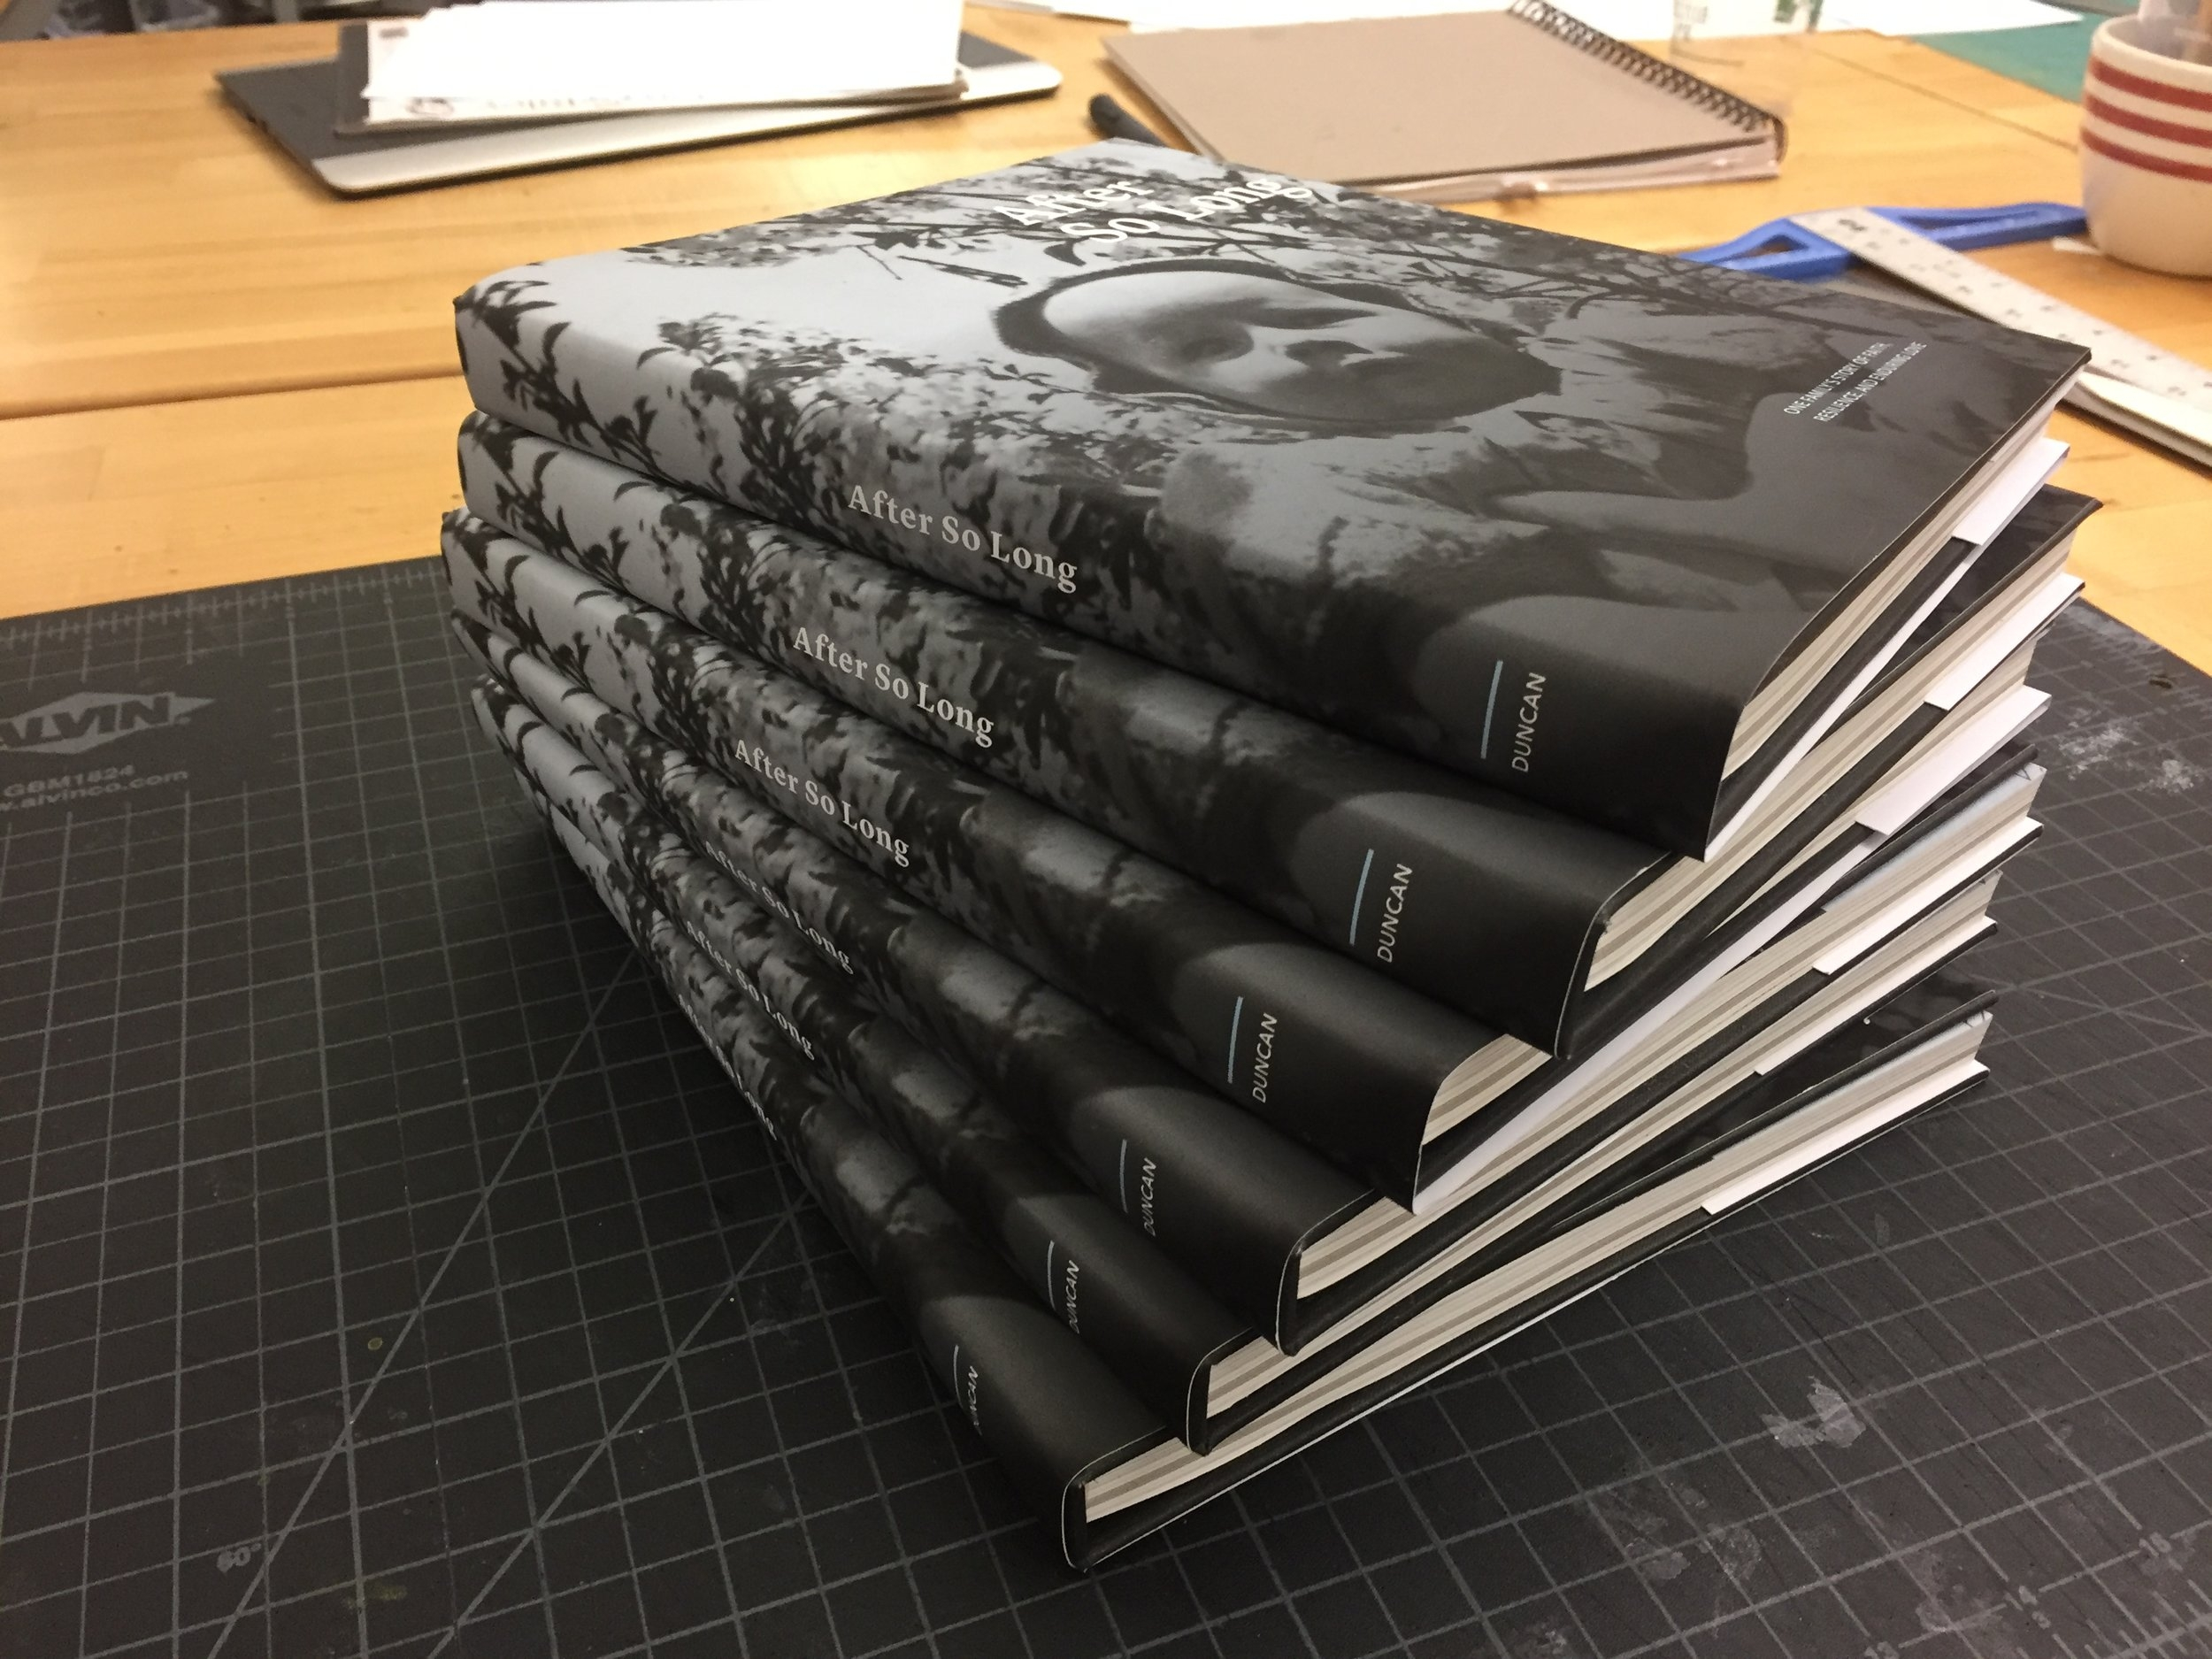 Six final bound copies